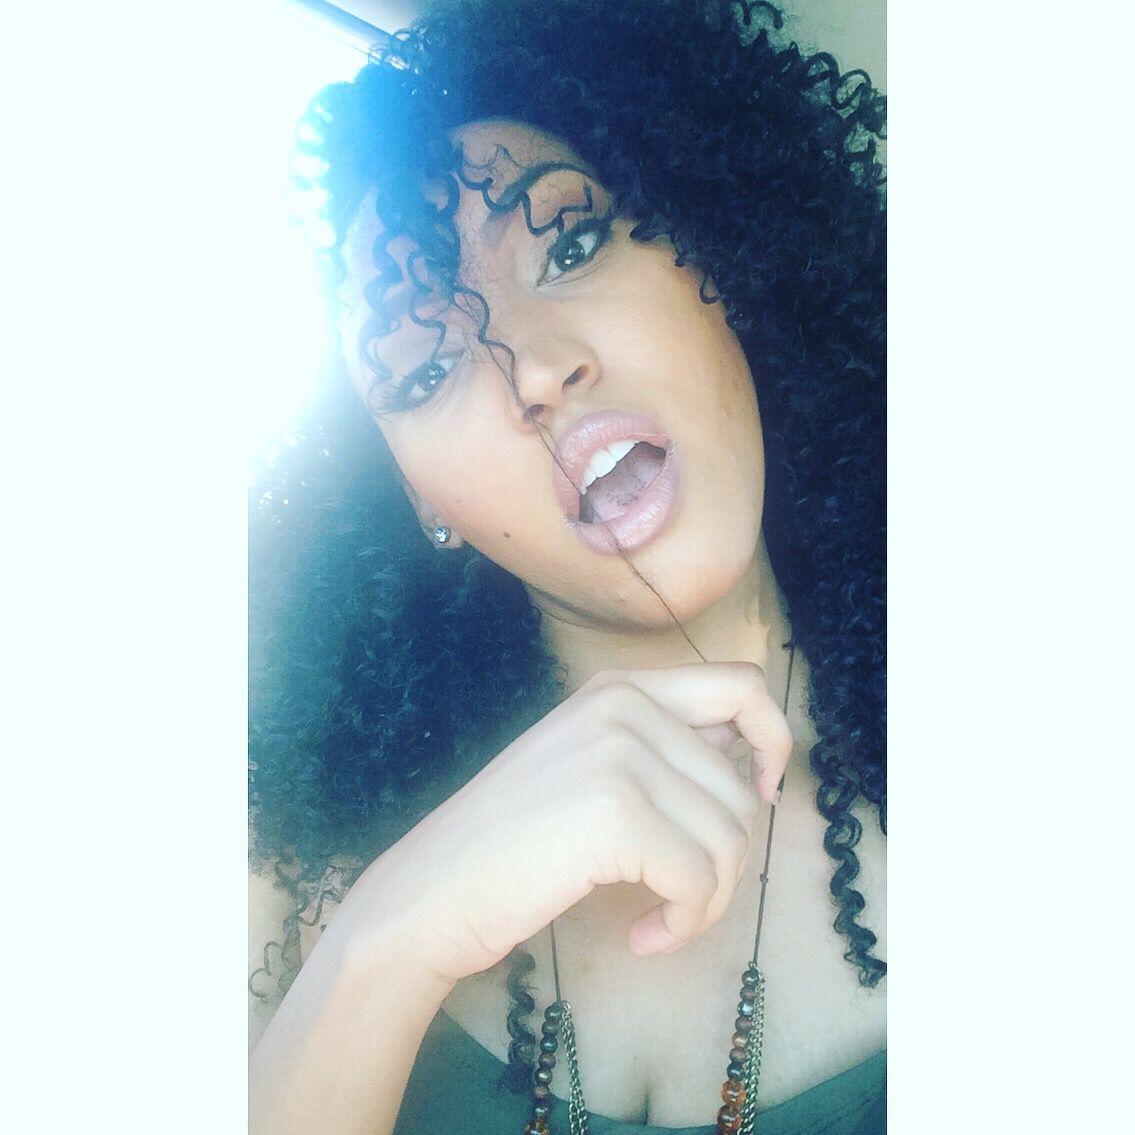 Black girls rock 💁🏽✊🏽 #curlysue | Hairstyles | Pinterest ...